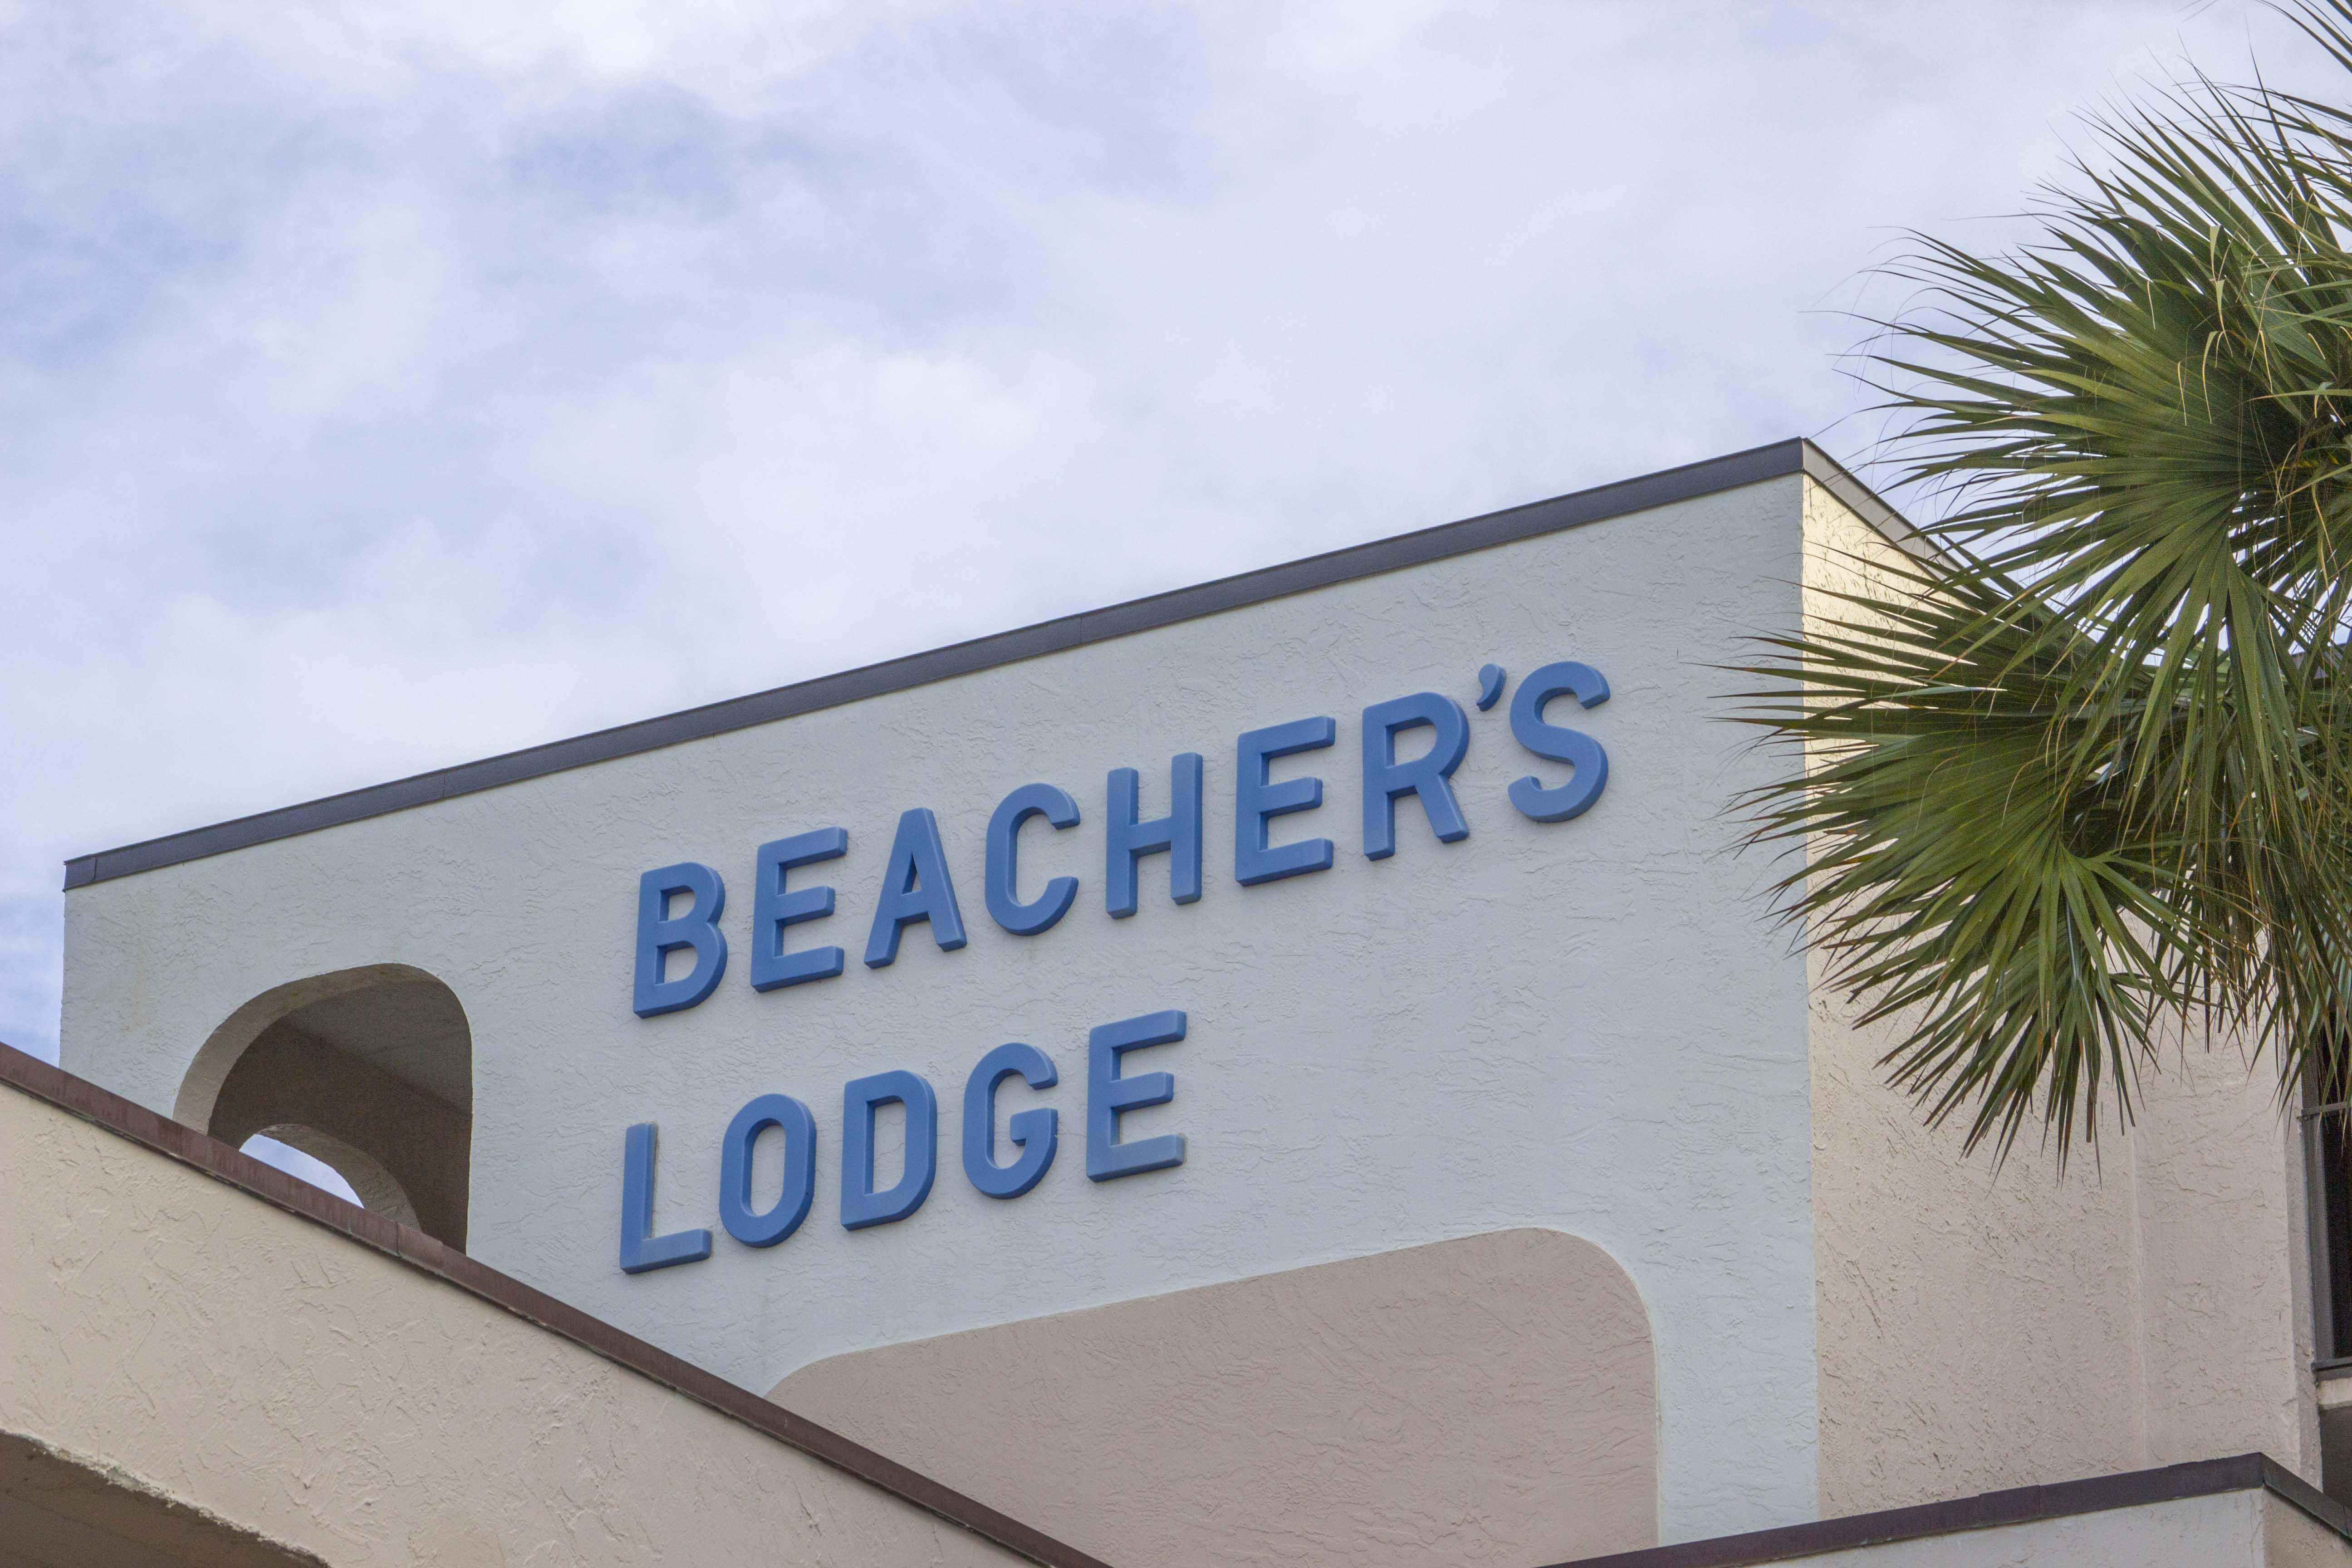 Beacher's Lodge!